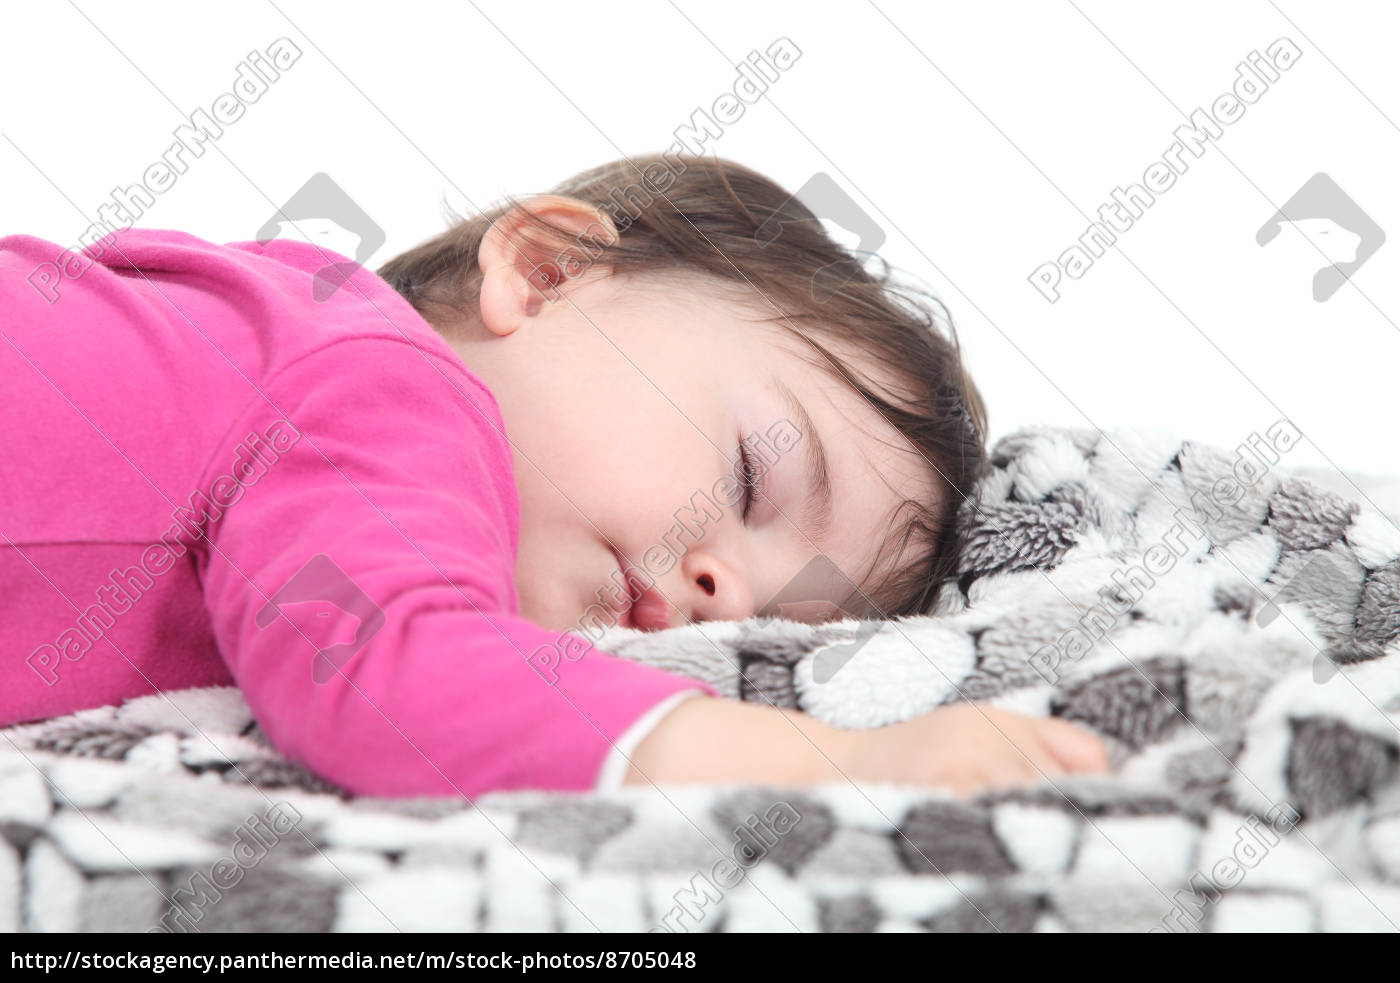 baby, sleeping, on, a, blanket - 8705048